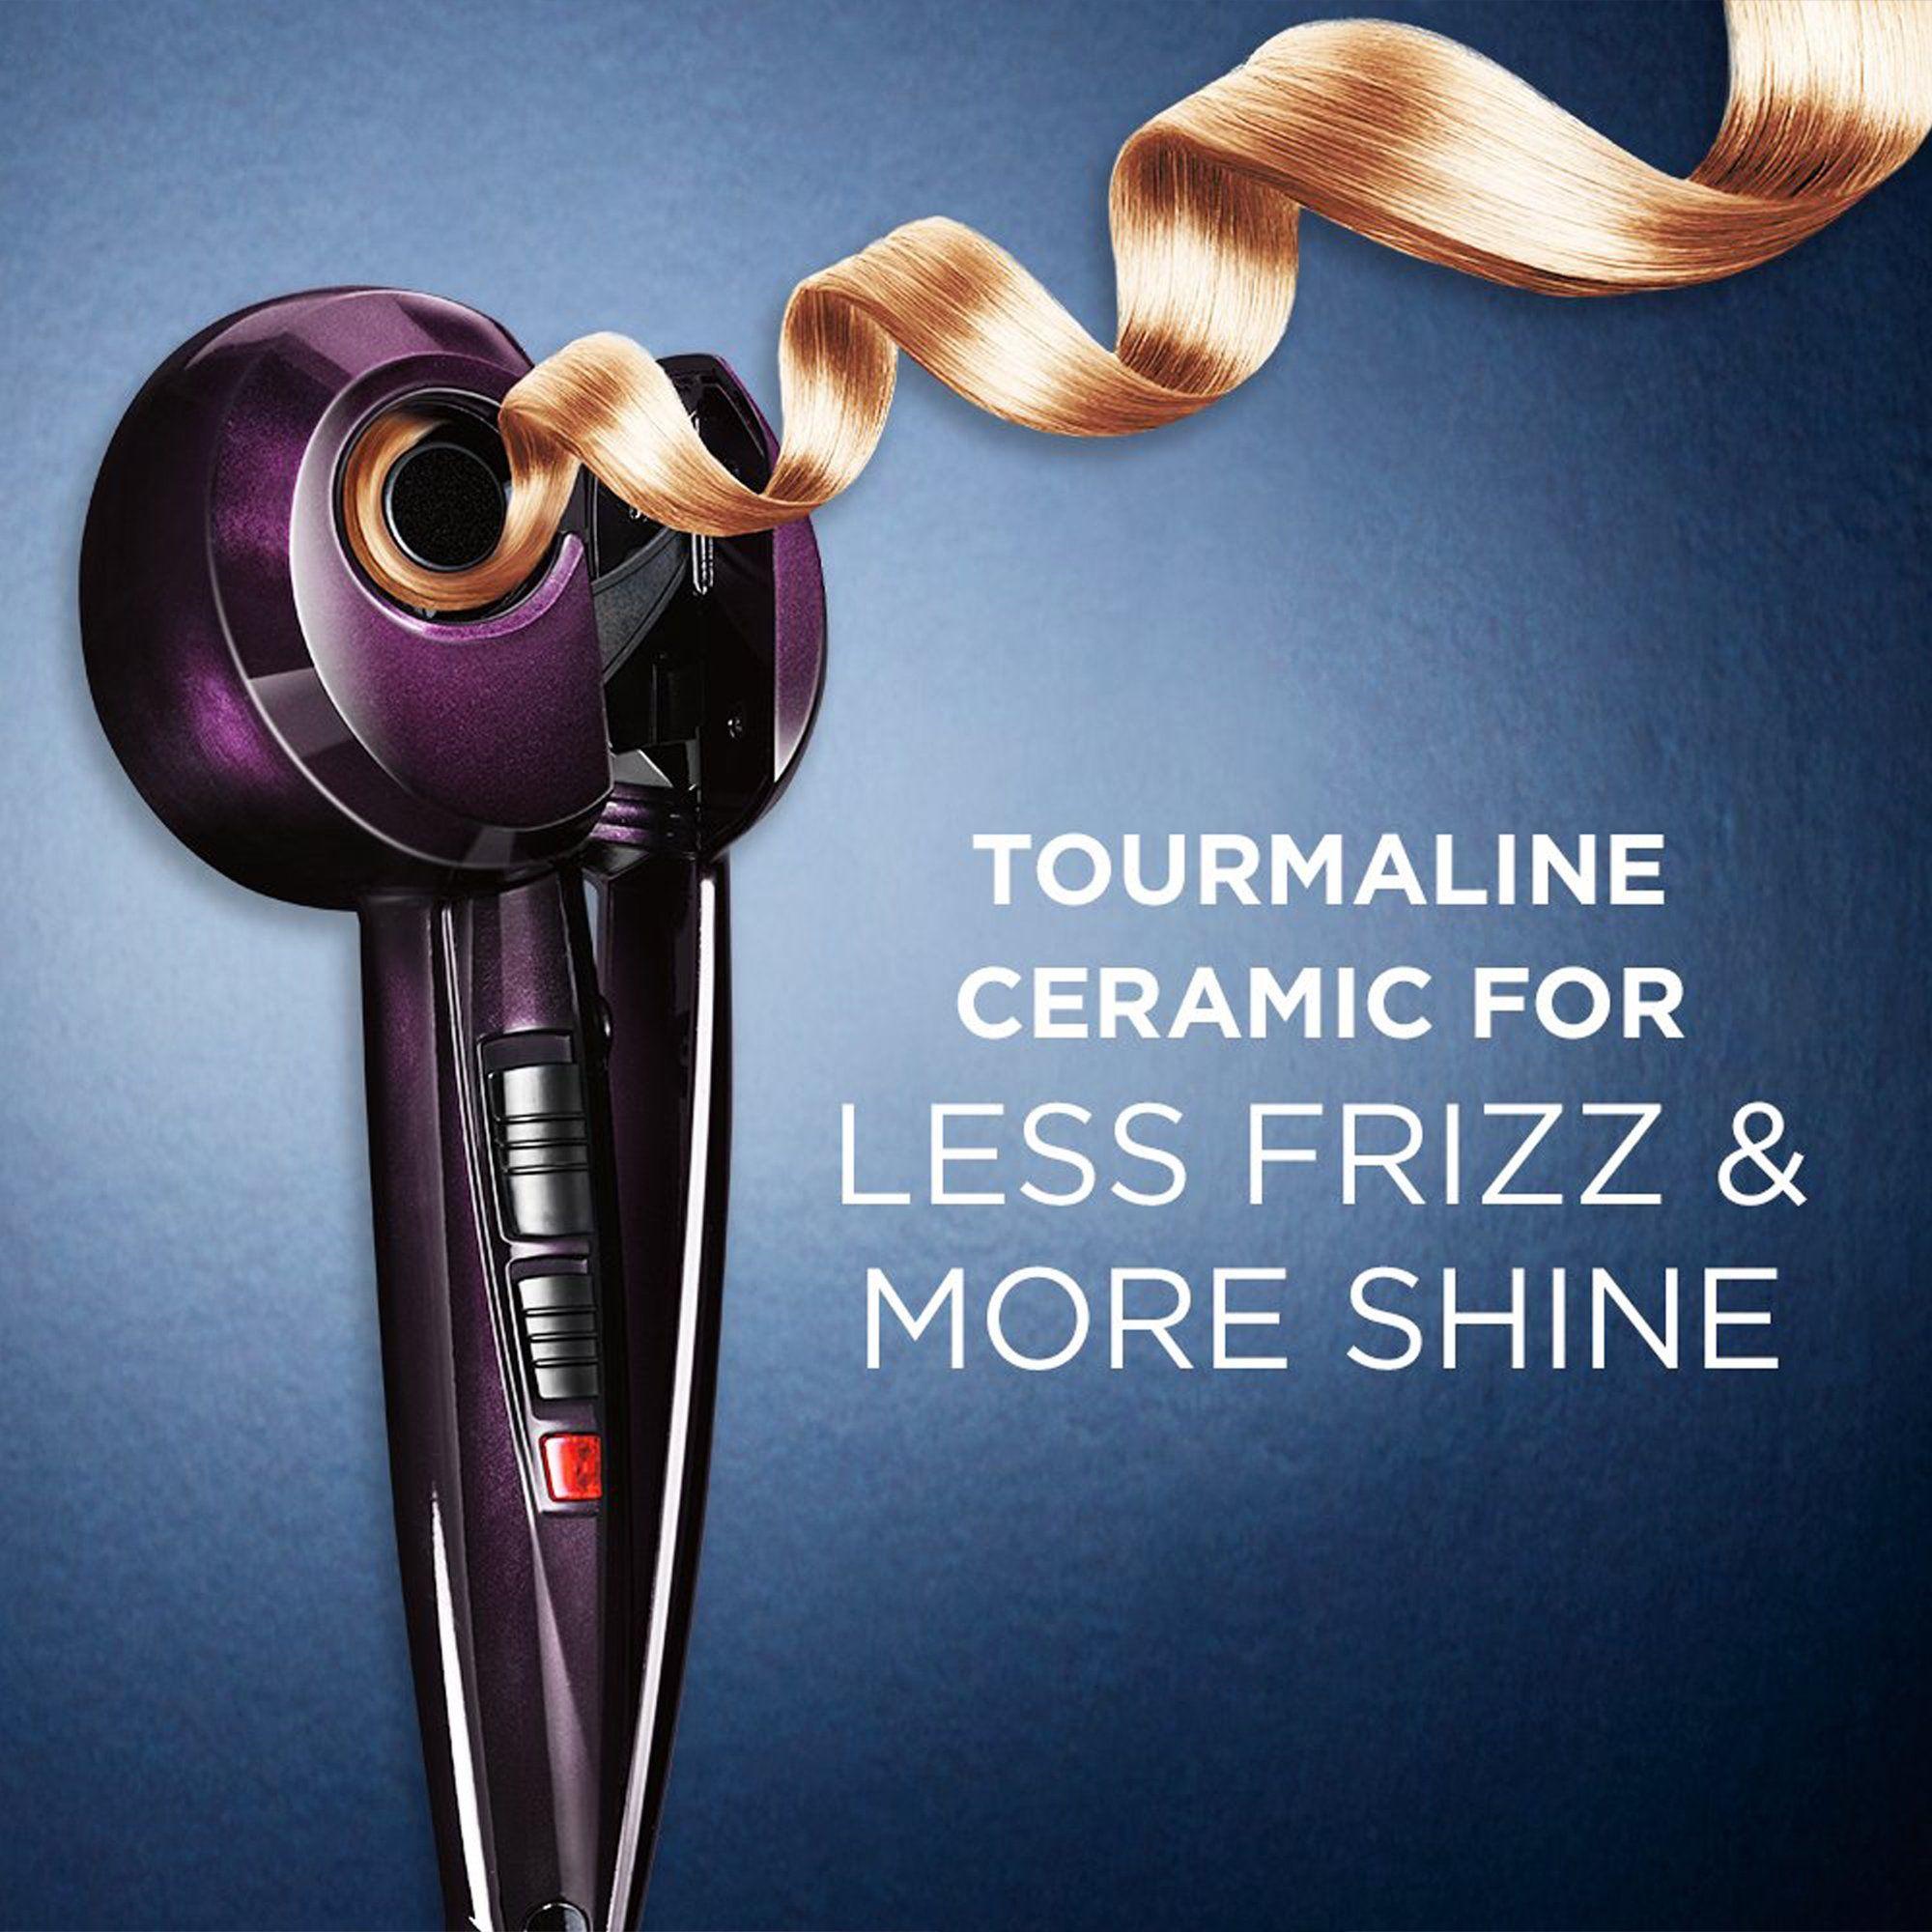 Infinitipro By Conair Curl Secret Curling Iron Purple Walmart Com In 2020 Curl Secret Conair Curl Secret Tin Foil Curls